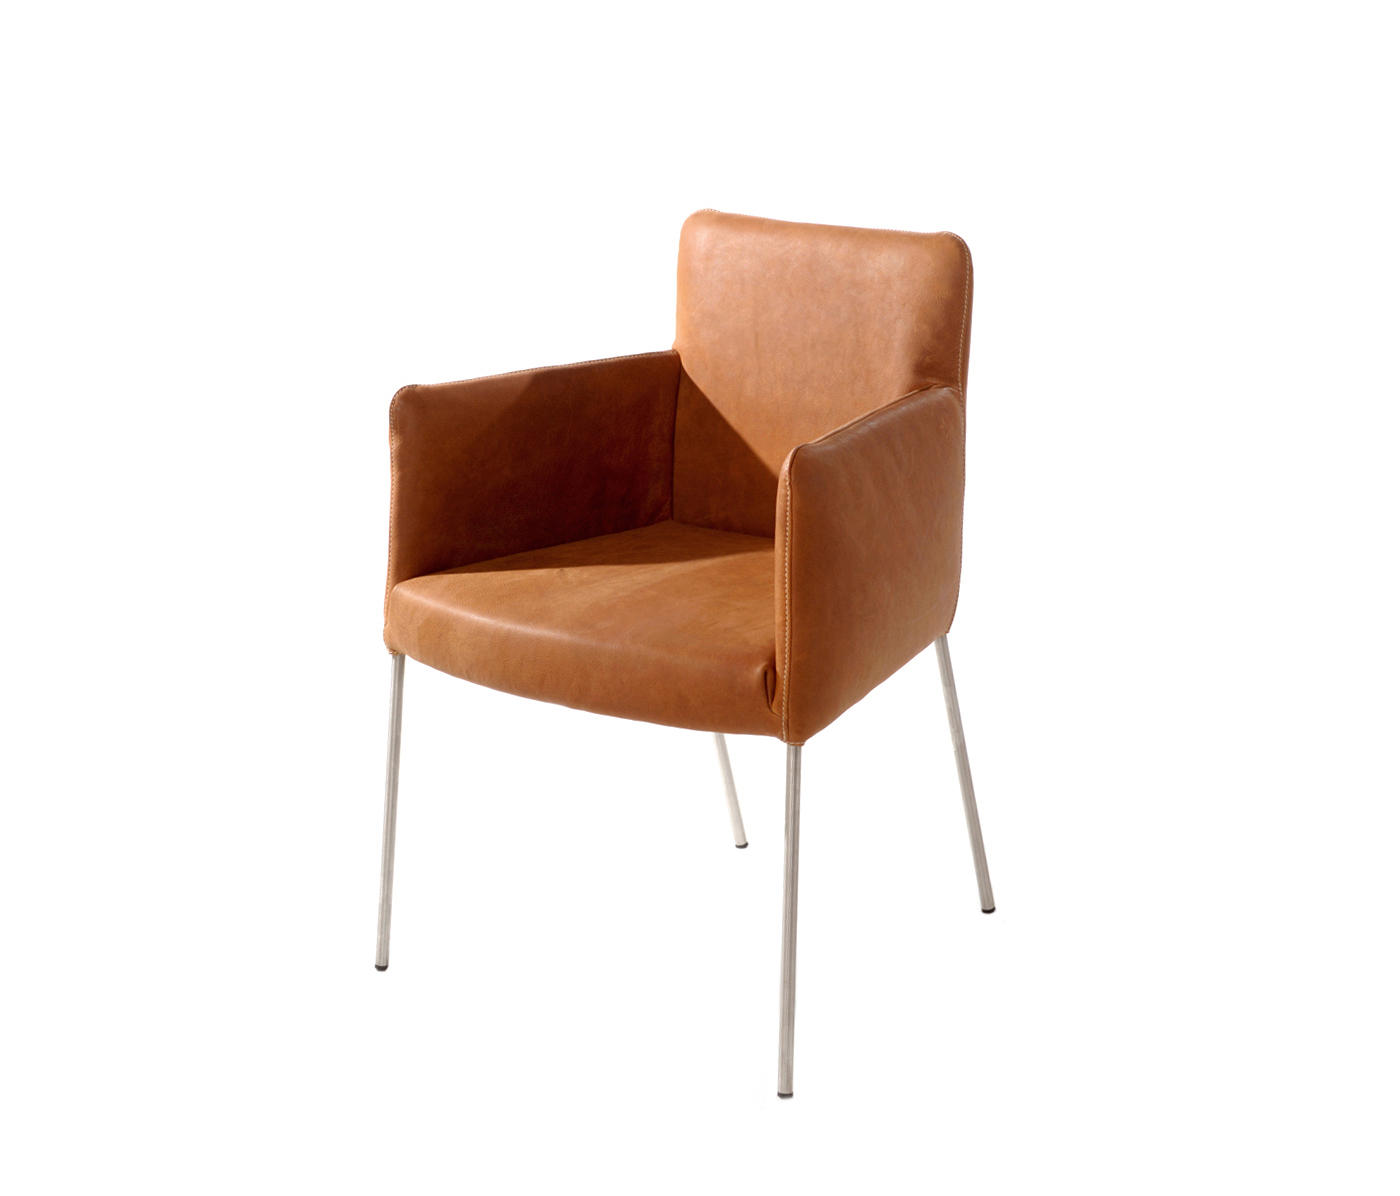 Bon Tiba Dining Chair By Label Van Den Berg | Chairs